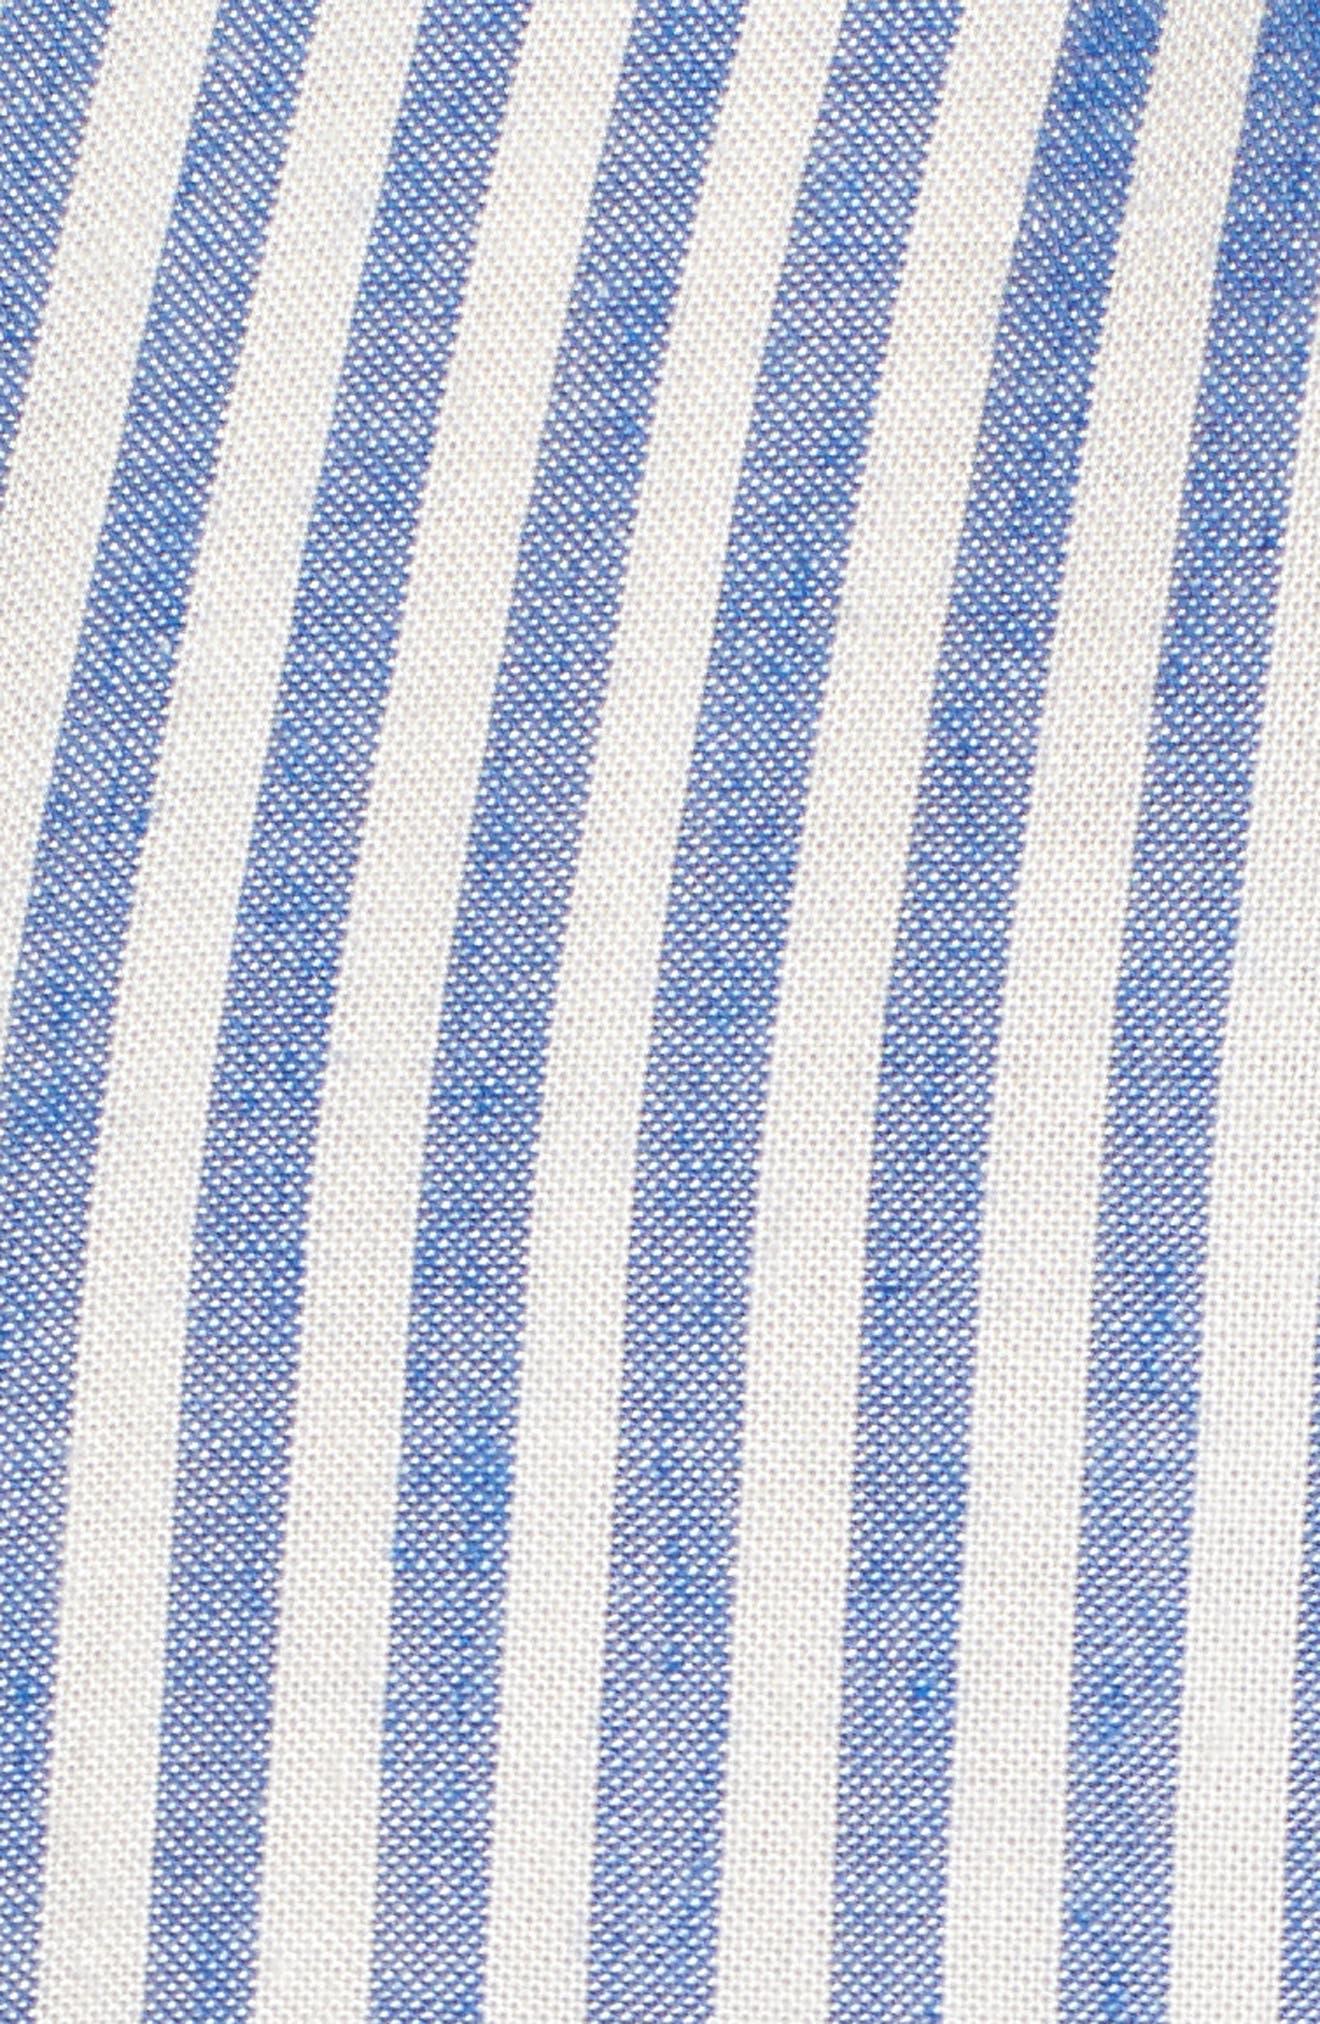 Stripe Top,                             Alternate thumbnail 5, color,                             400